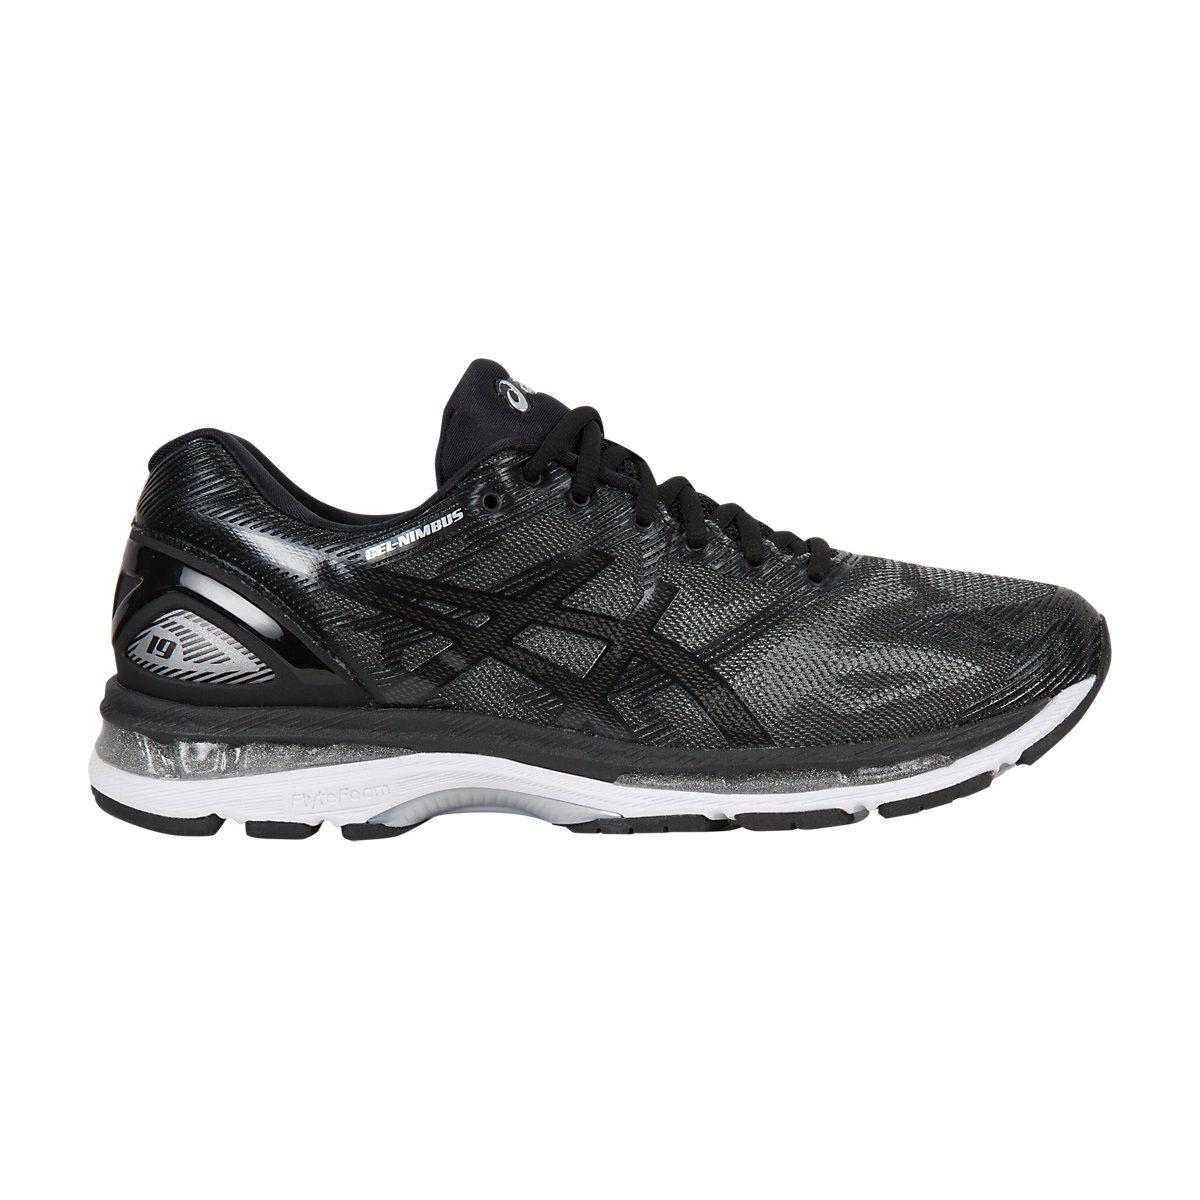 Sepatu Lari/ Running Asics Gel Nimbus 19 Hitam - T700N.9099